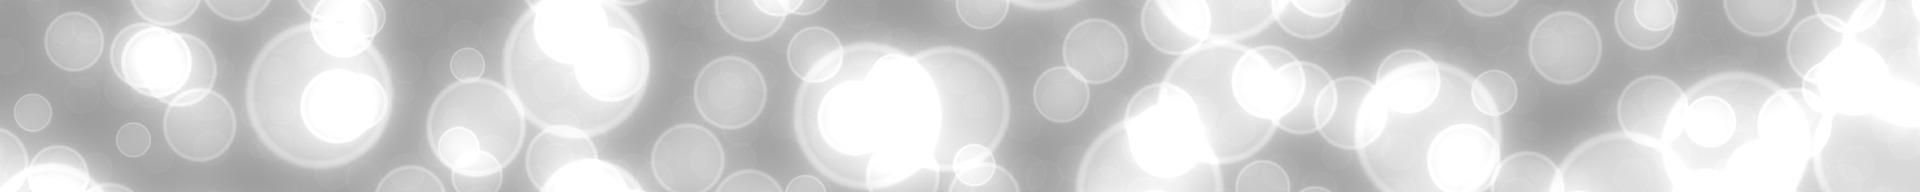 Grey luminous circles_narrow banner.png